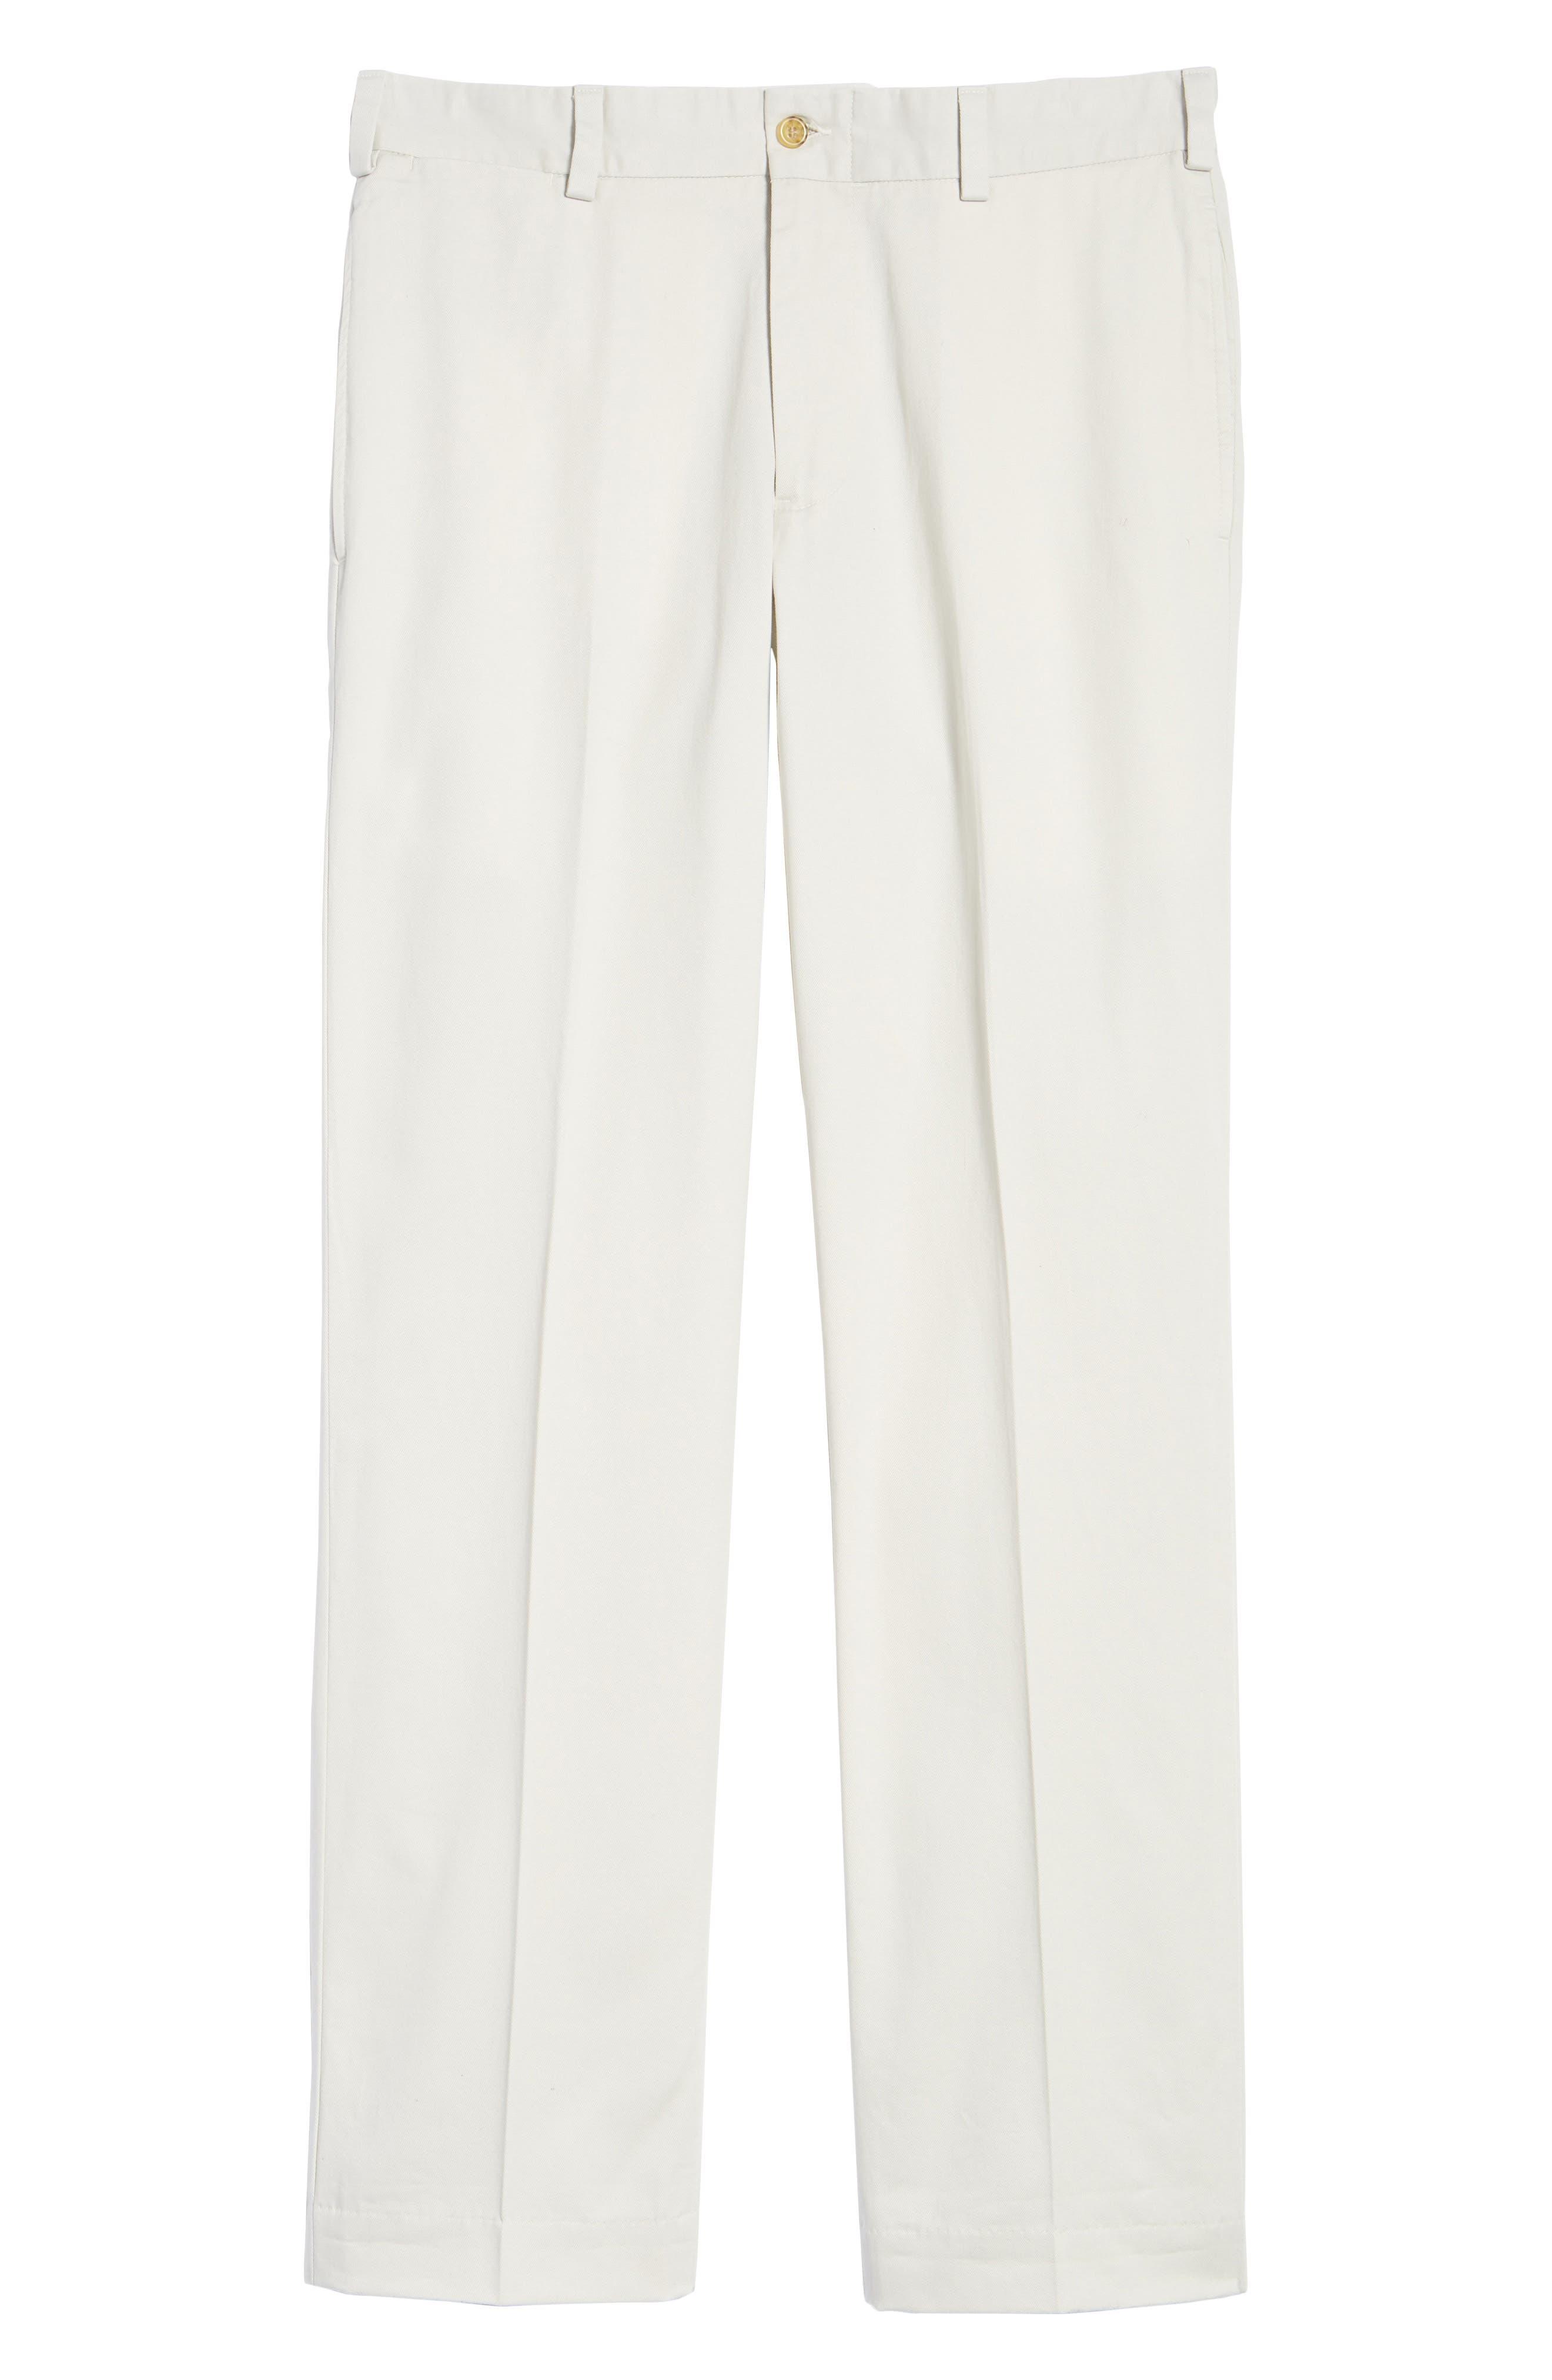 M2 Classic Fit Vintage Twill Flat Front Pants,                             Alternate thumbnail 6, color,                             Stone